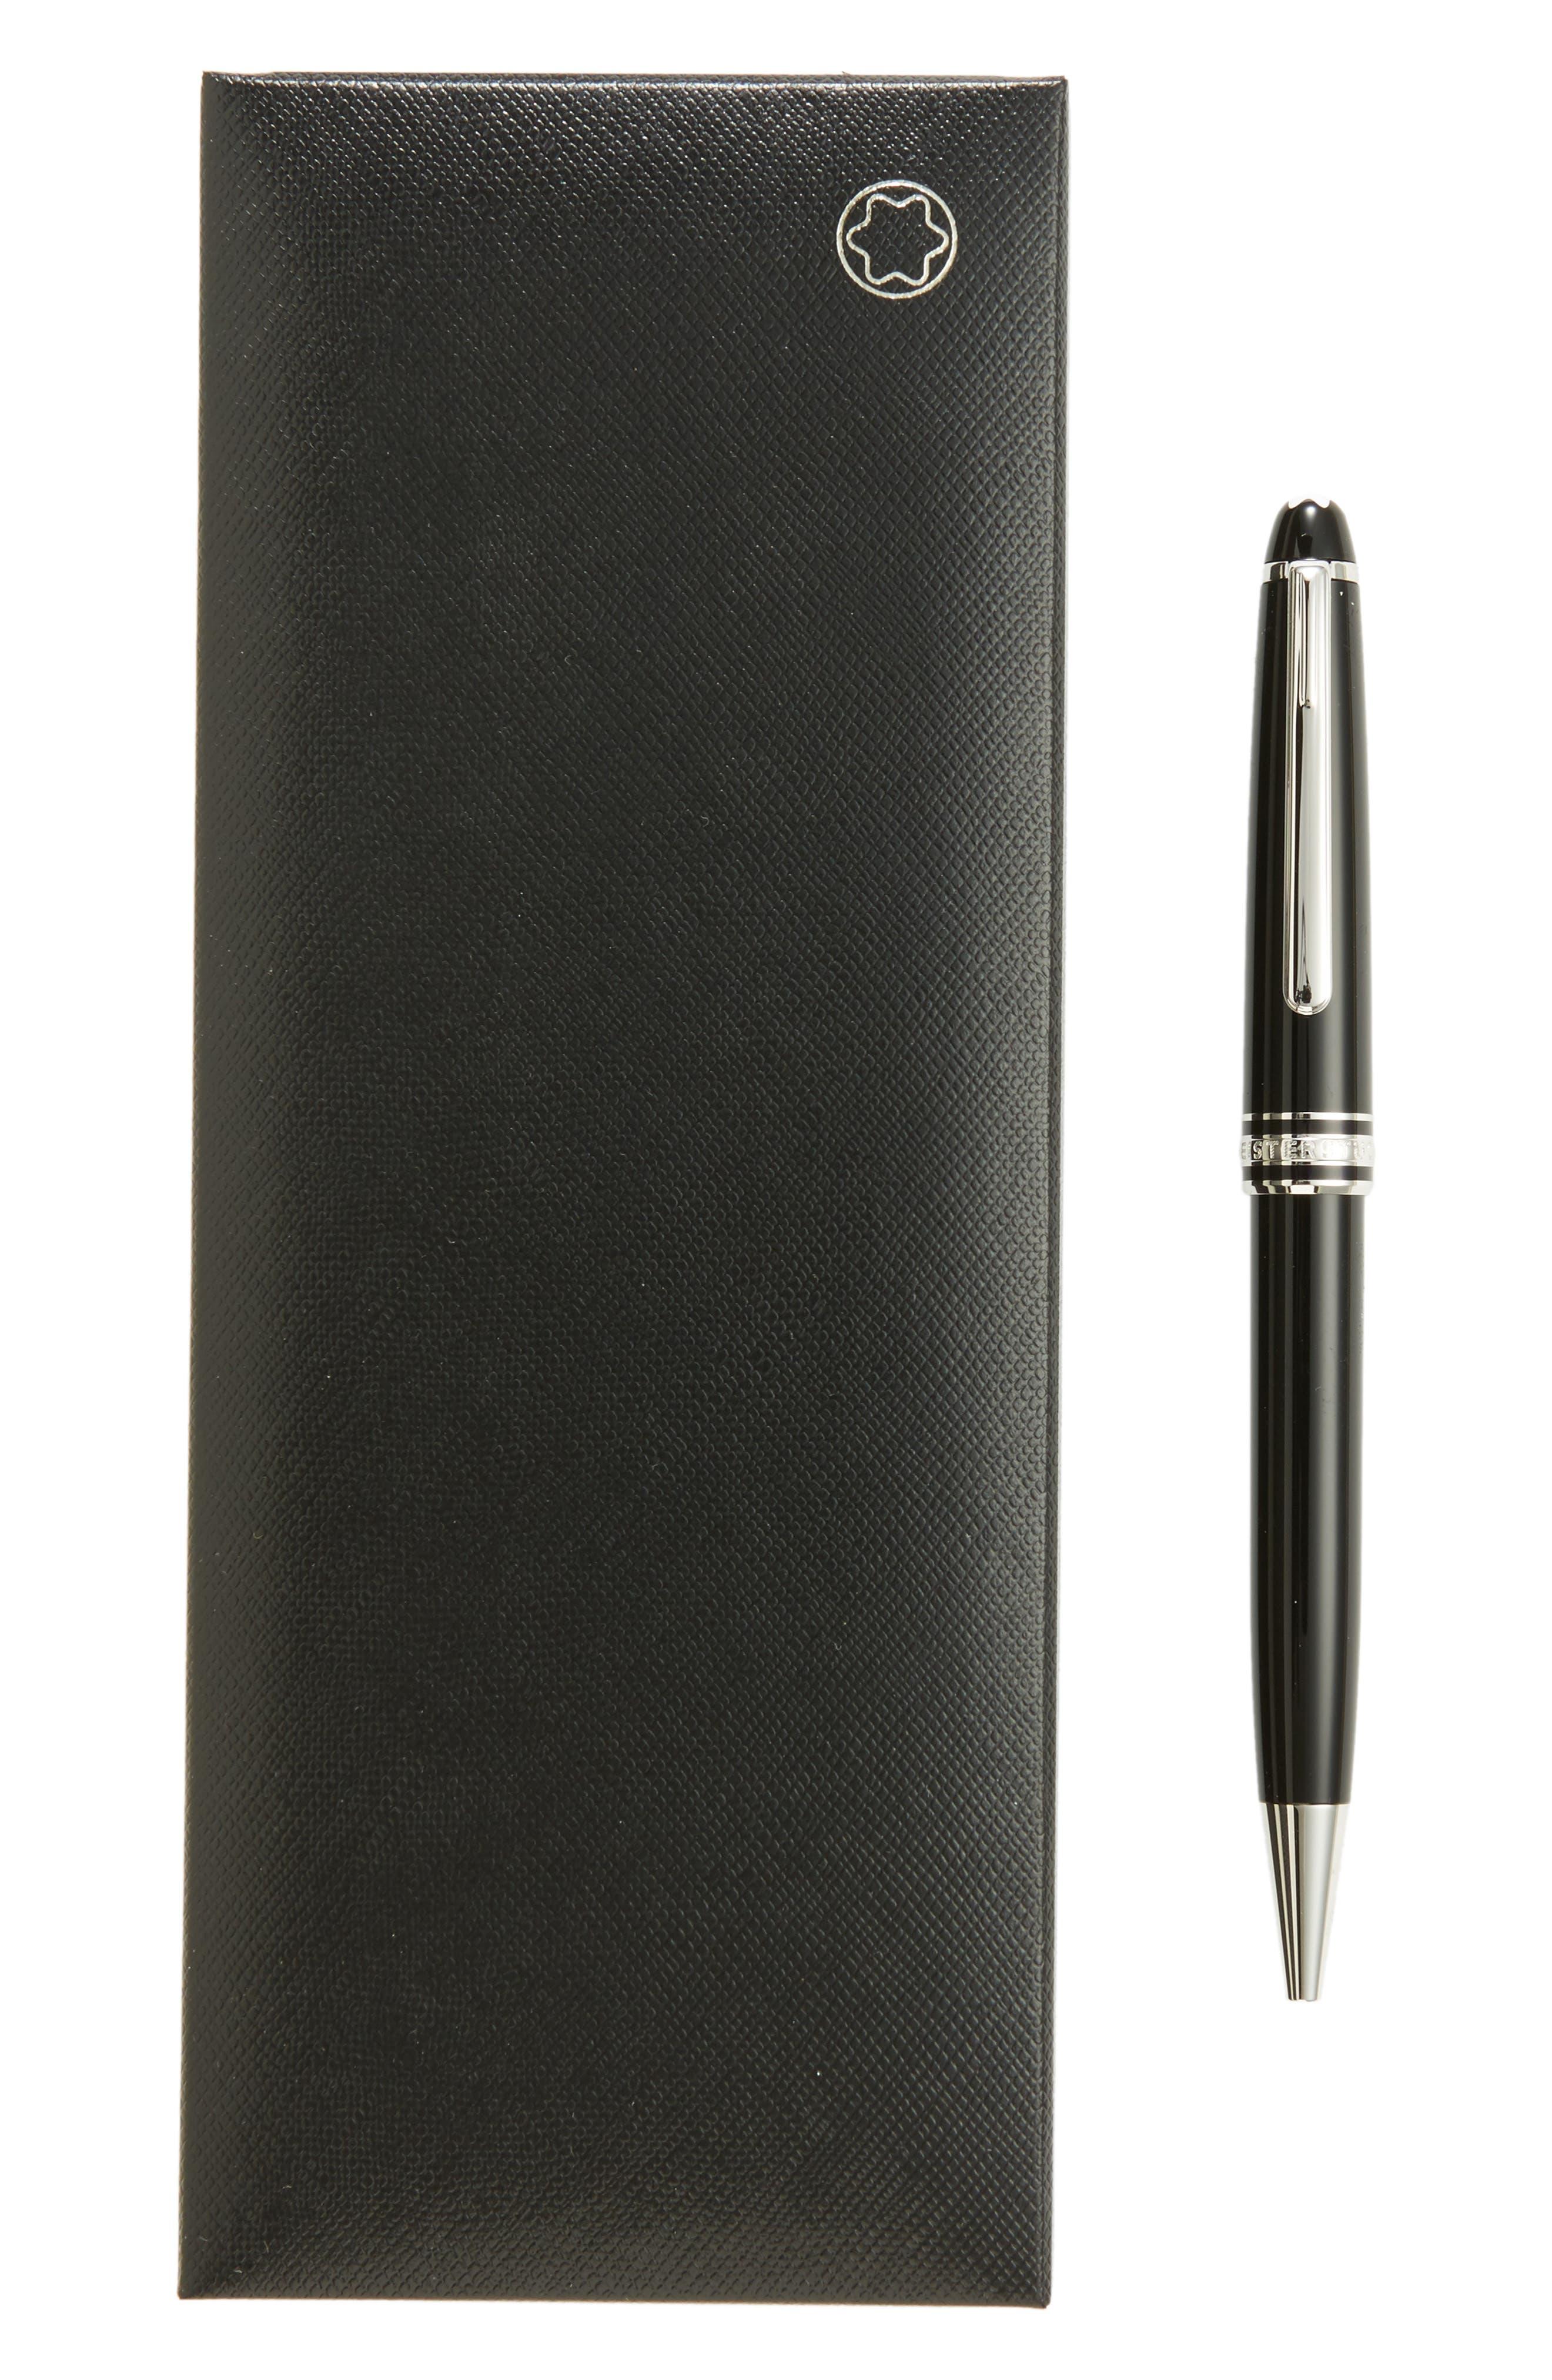 MONTBLANC Meisterstück Platinum Coated Classique Ballpoint Pen